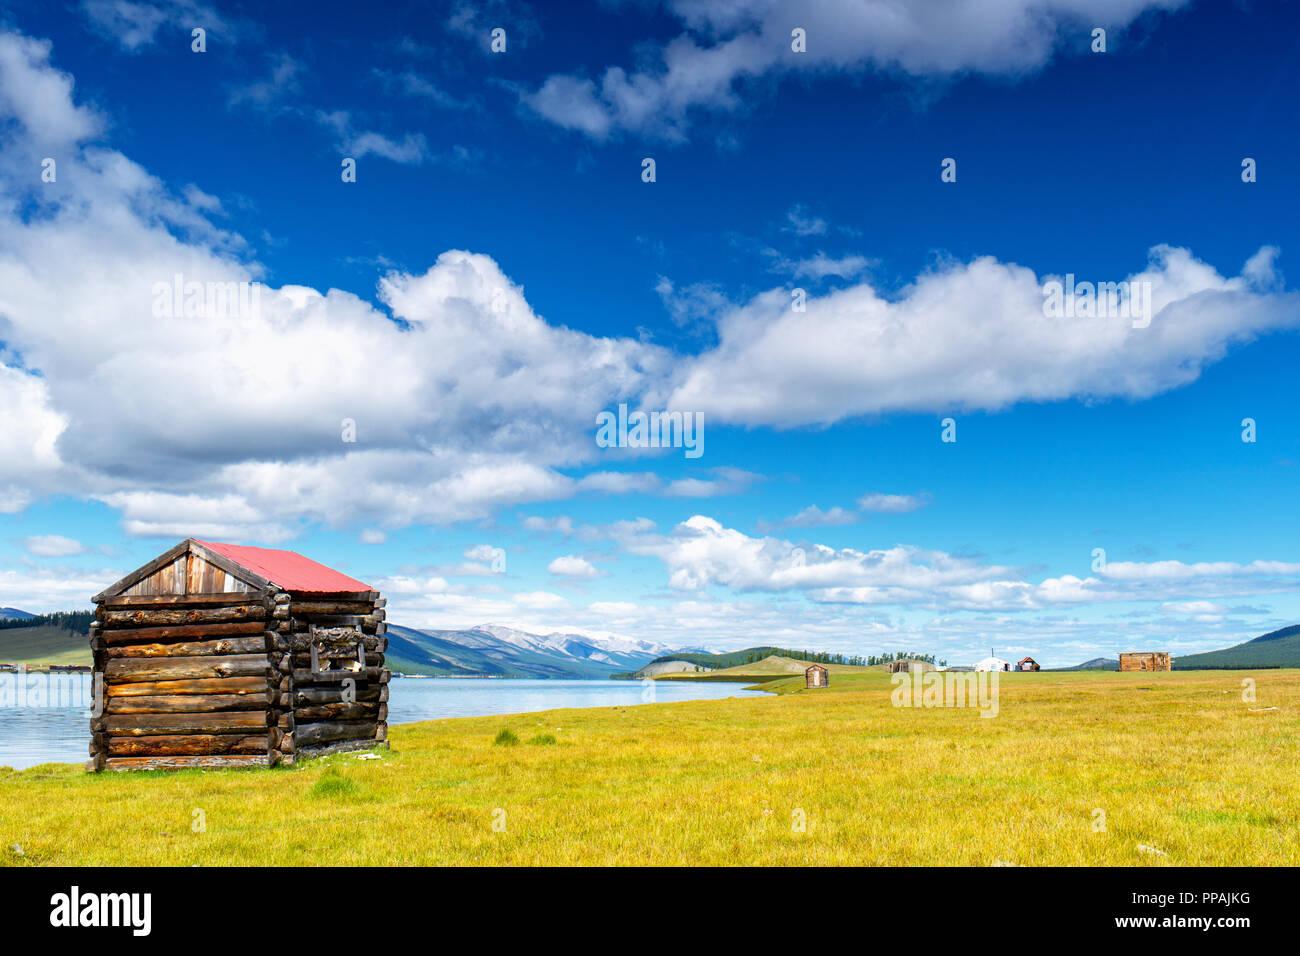 Small hut and a gear at Lake Khovsgol shore, Khatgal, Mongolia - Stock Image